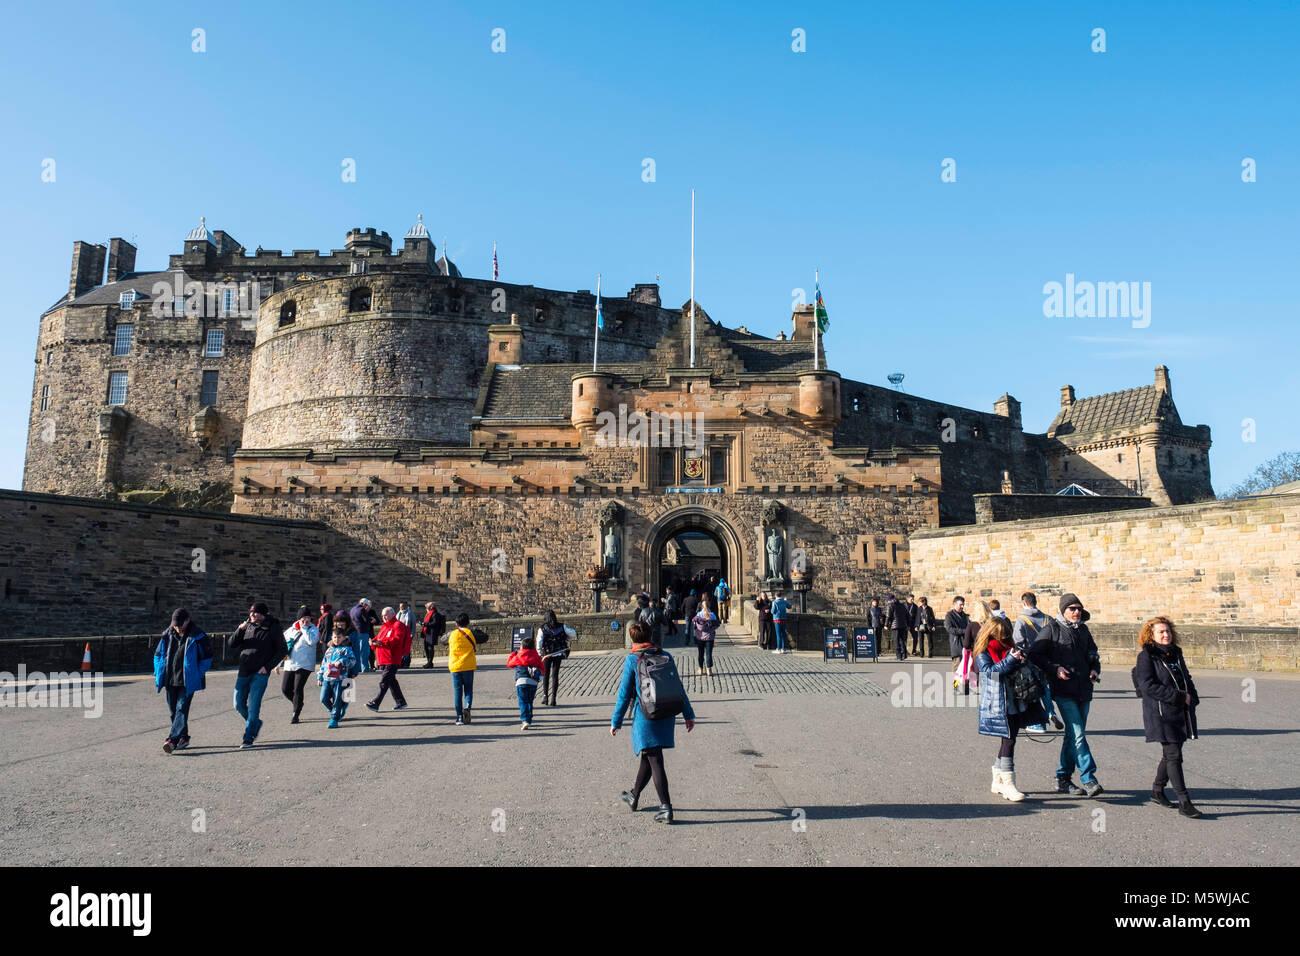 View of entrance to Edinburgh Castle on esplanade in Edinburgh, Scotland, United Kingdom - Stock Image